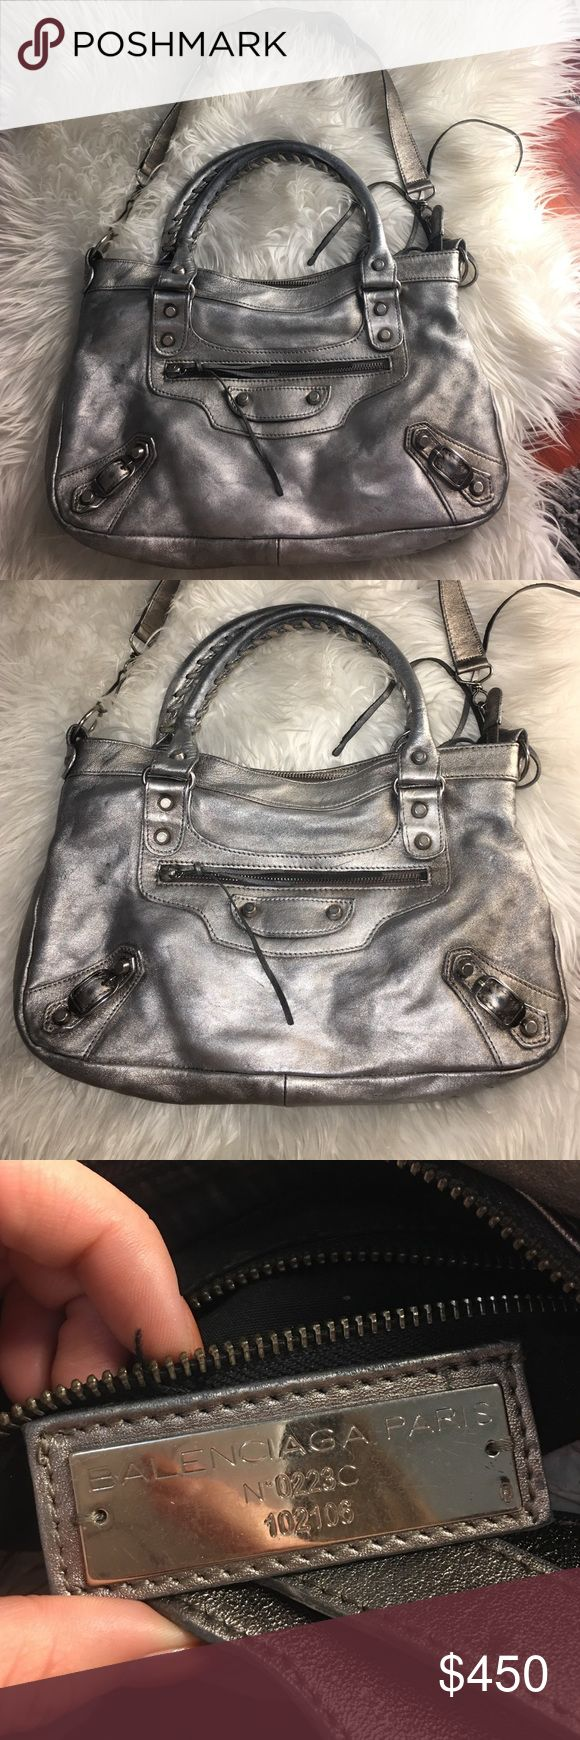 BALENCIAGA METALLIC SILVER BAG Balenciaga City Aluminum Metallic Silver Shoulder Bag. Not exactly sure which style it is. May be moto cross or city? Will email more photos. MISSING MIRROR. Balenciaga Bags